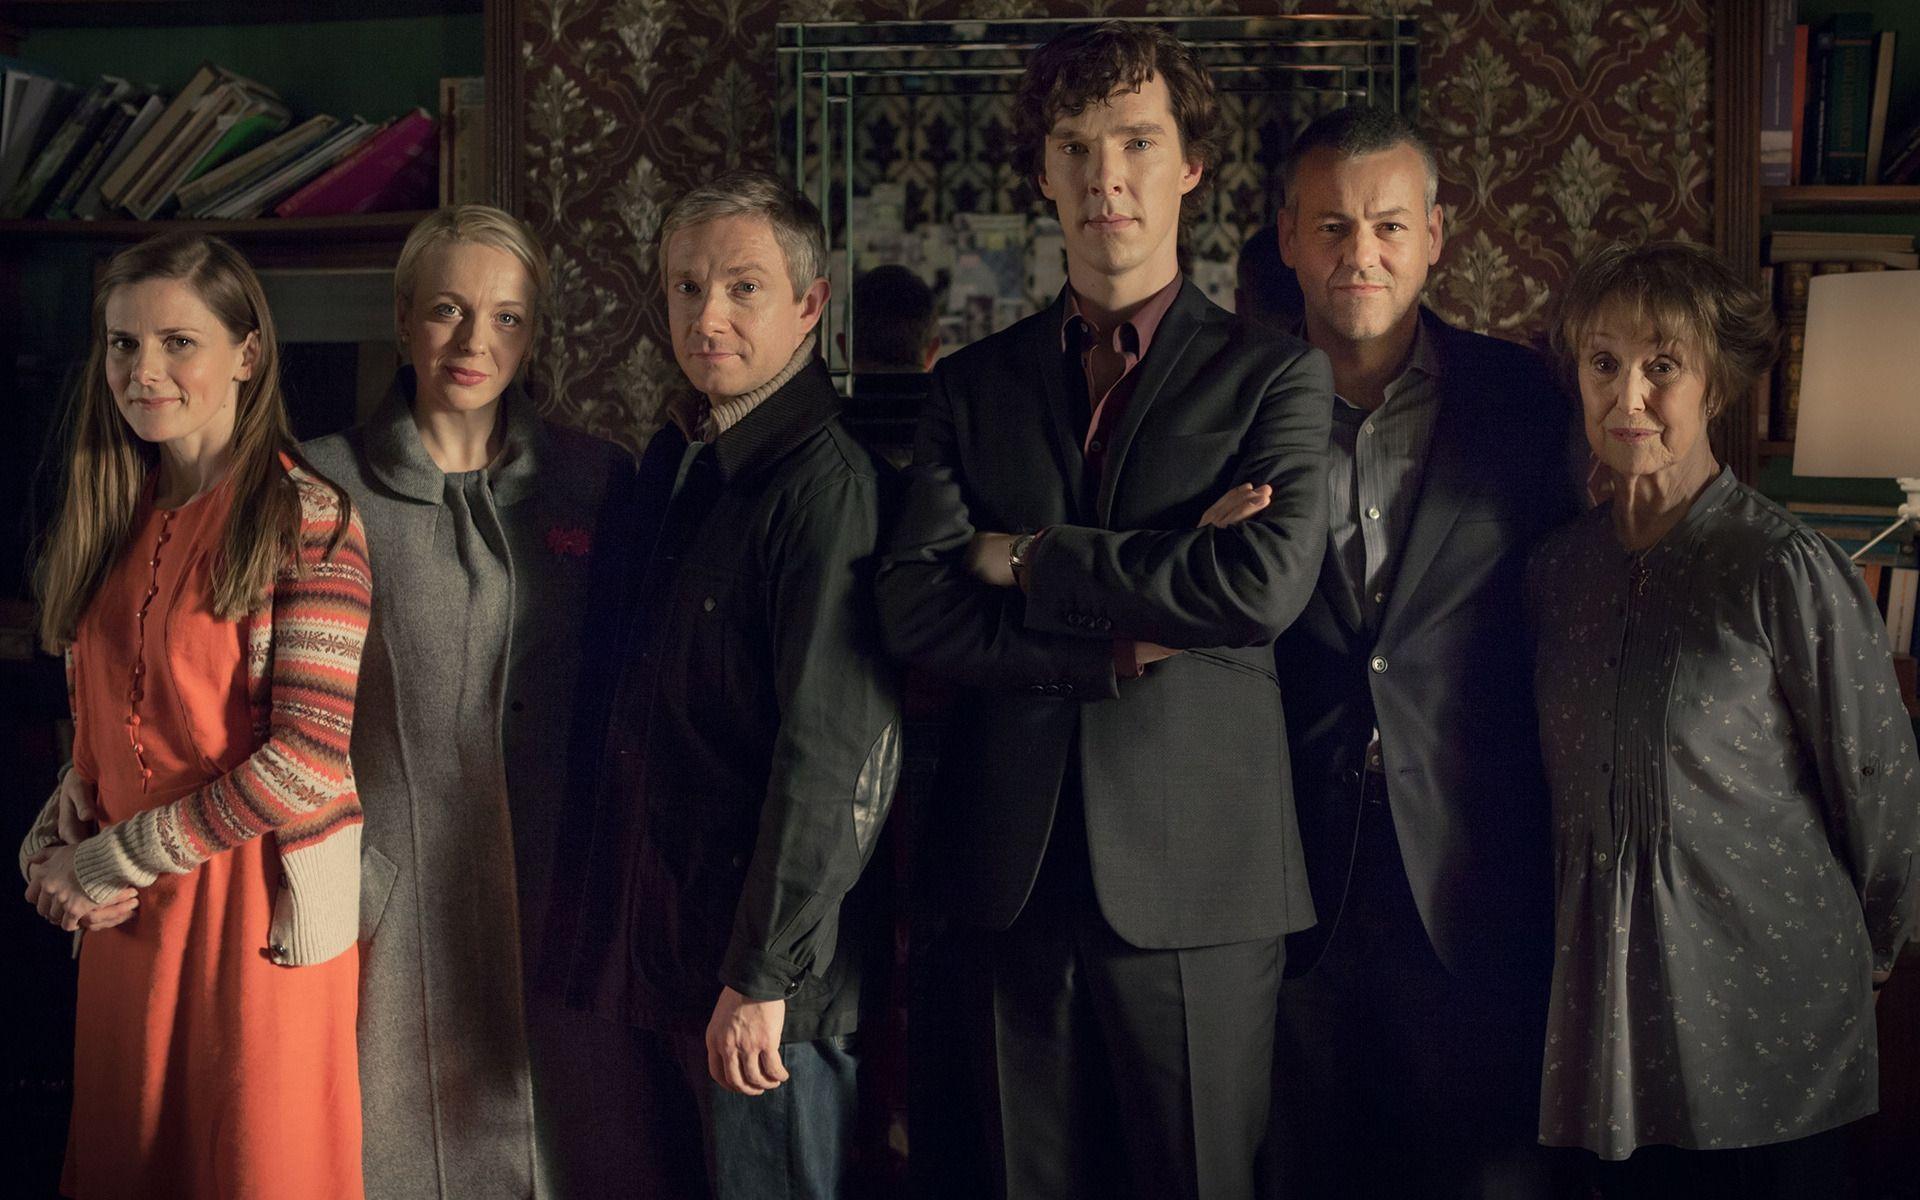 Wallpaper-HD-BBC-Sherlock-Cast - wallpaper.wiki